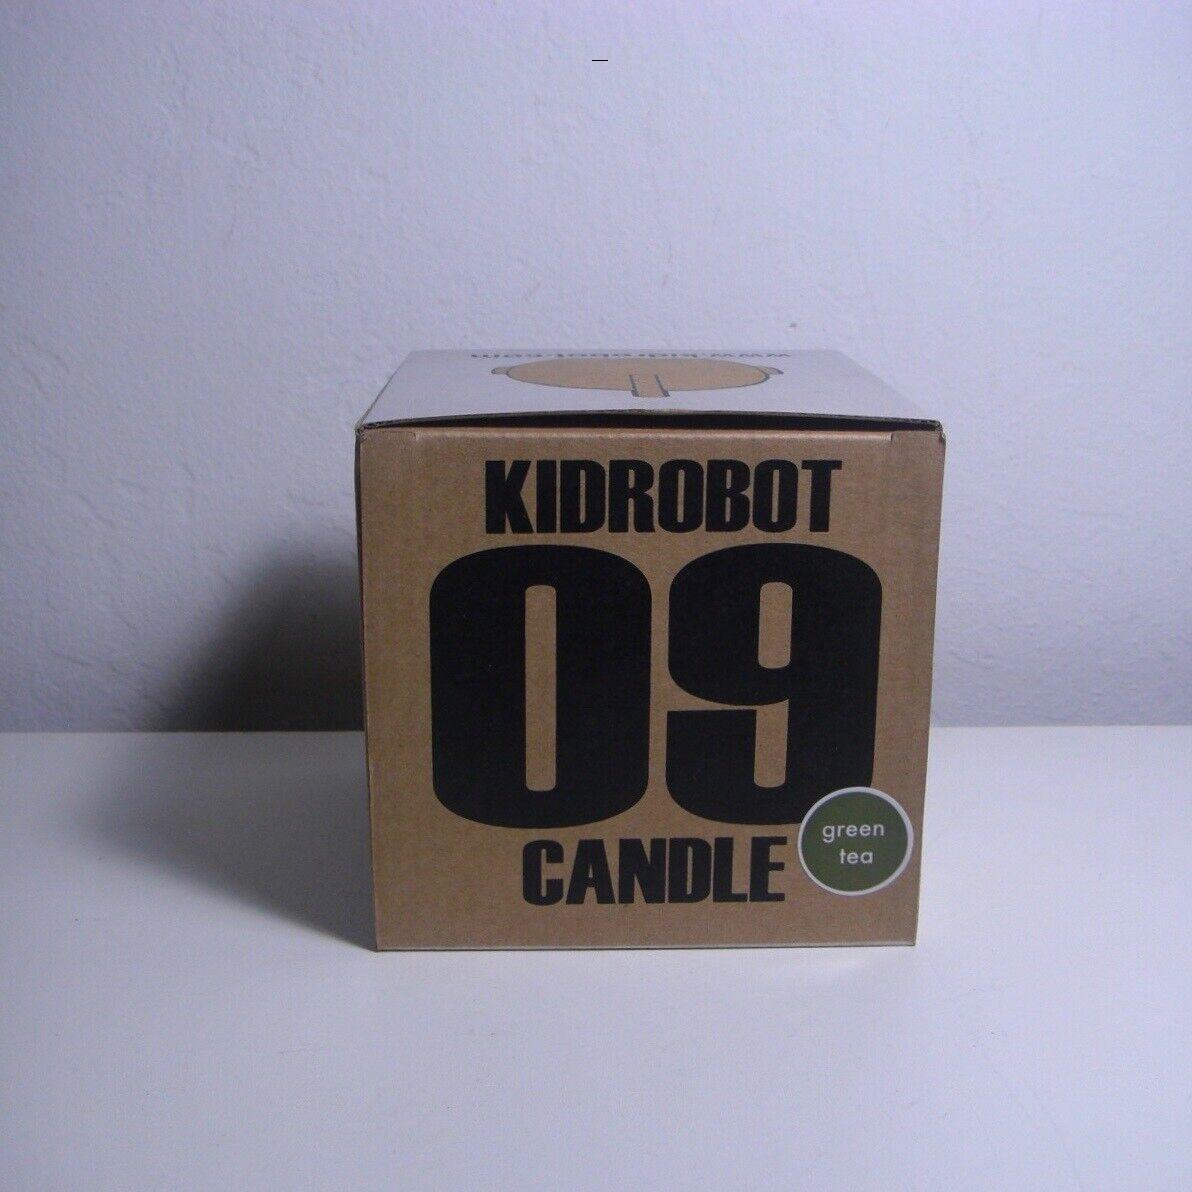 Kidrobot Mascot Head Candle 09 Grün Tea Scent NEW RARE 2009